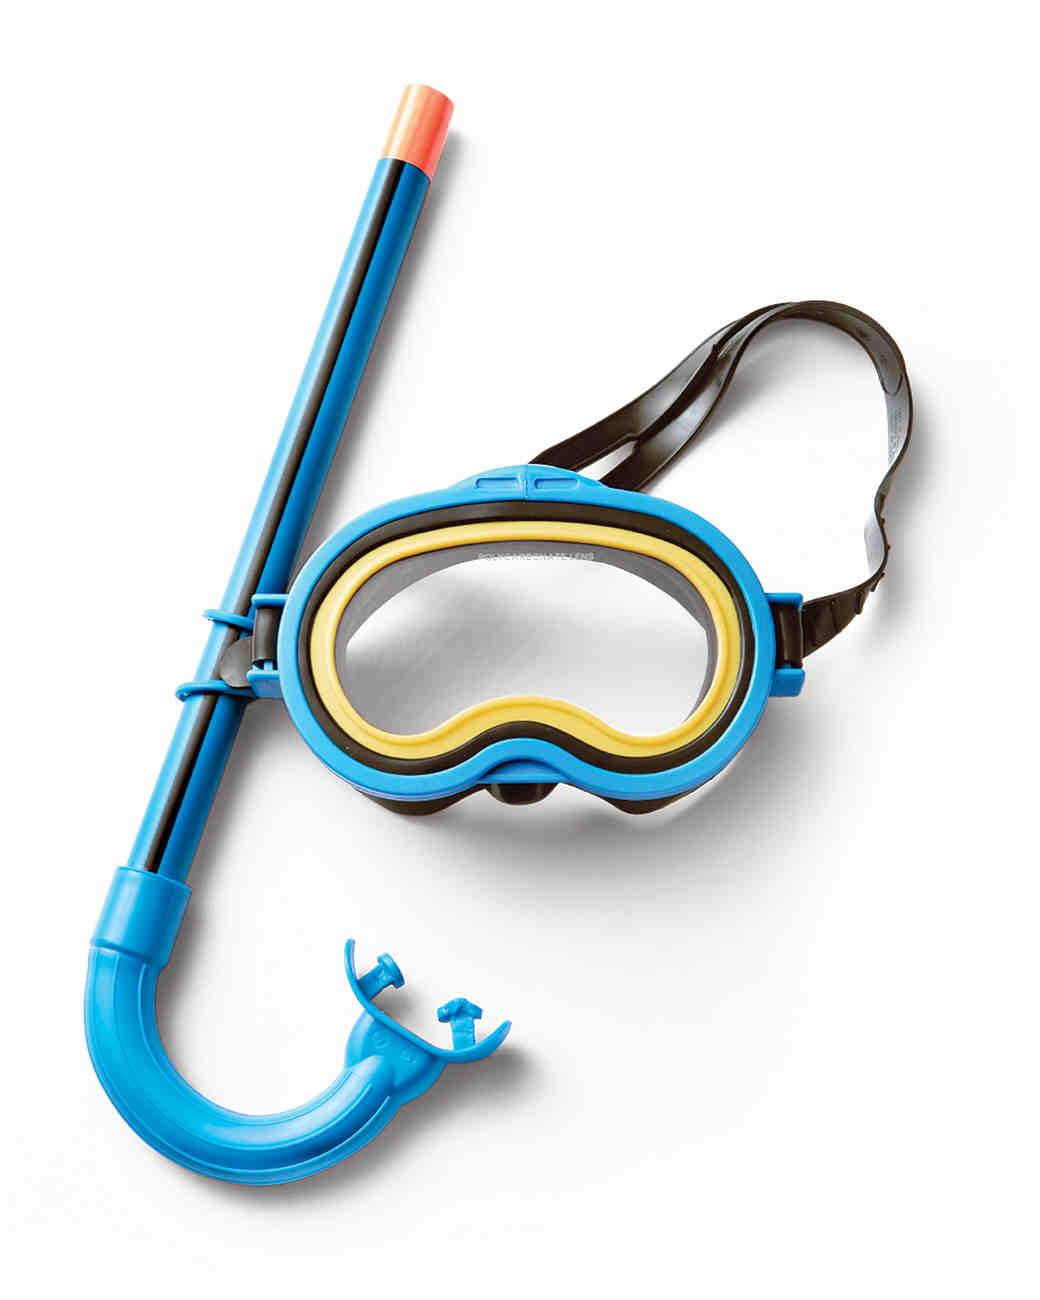 snorkel-istock-000002113429medium-mwds111196.jpg